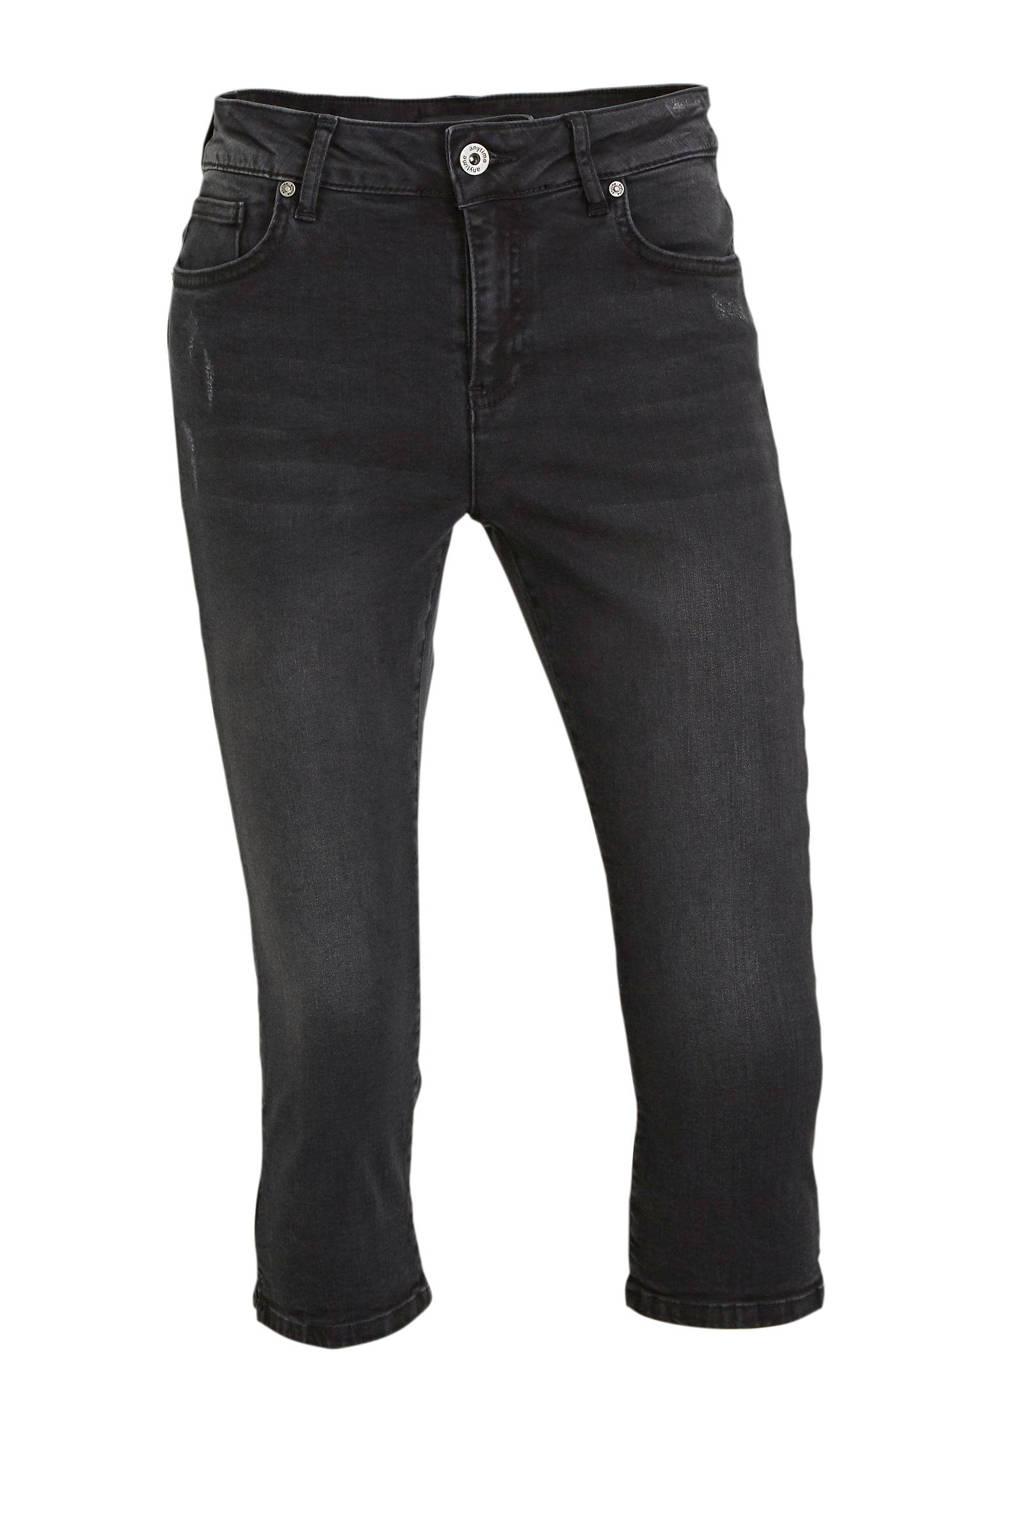 anytime jeans-capri used black, Used black